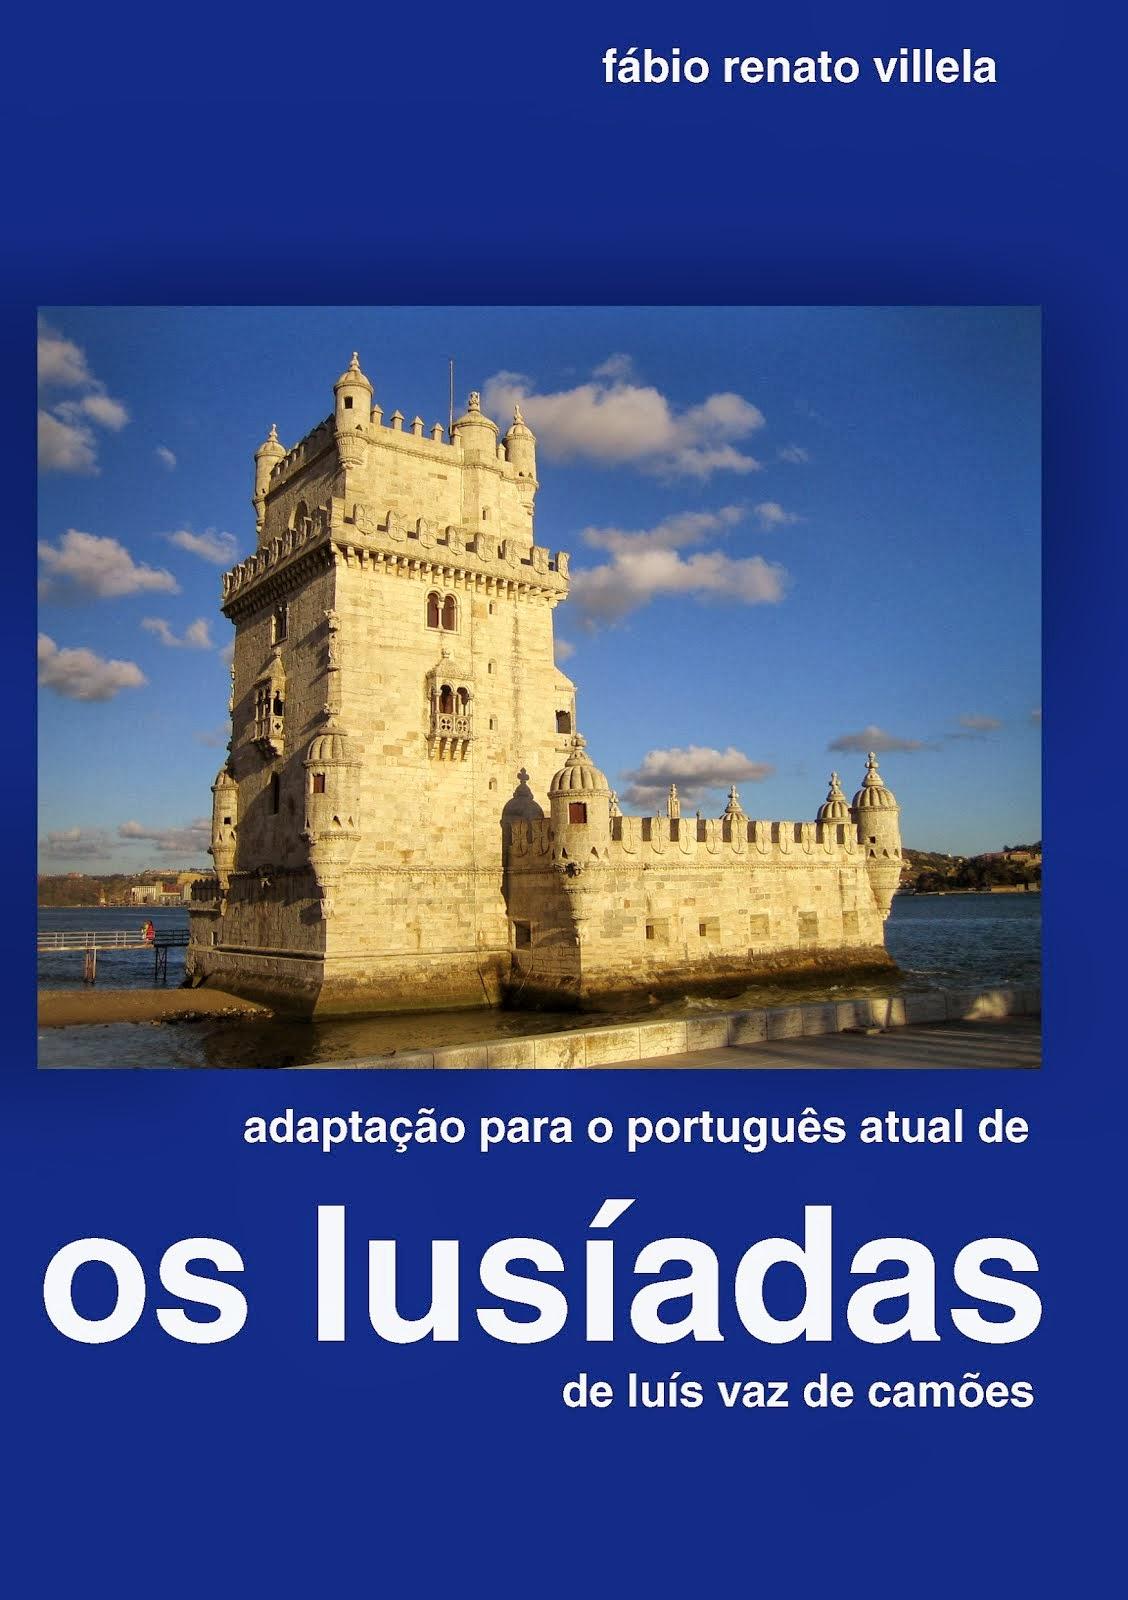 Adap. de OS LUSÍADAS 3ª Ed.